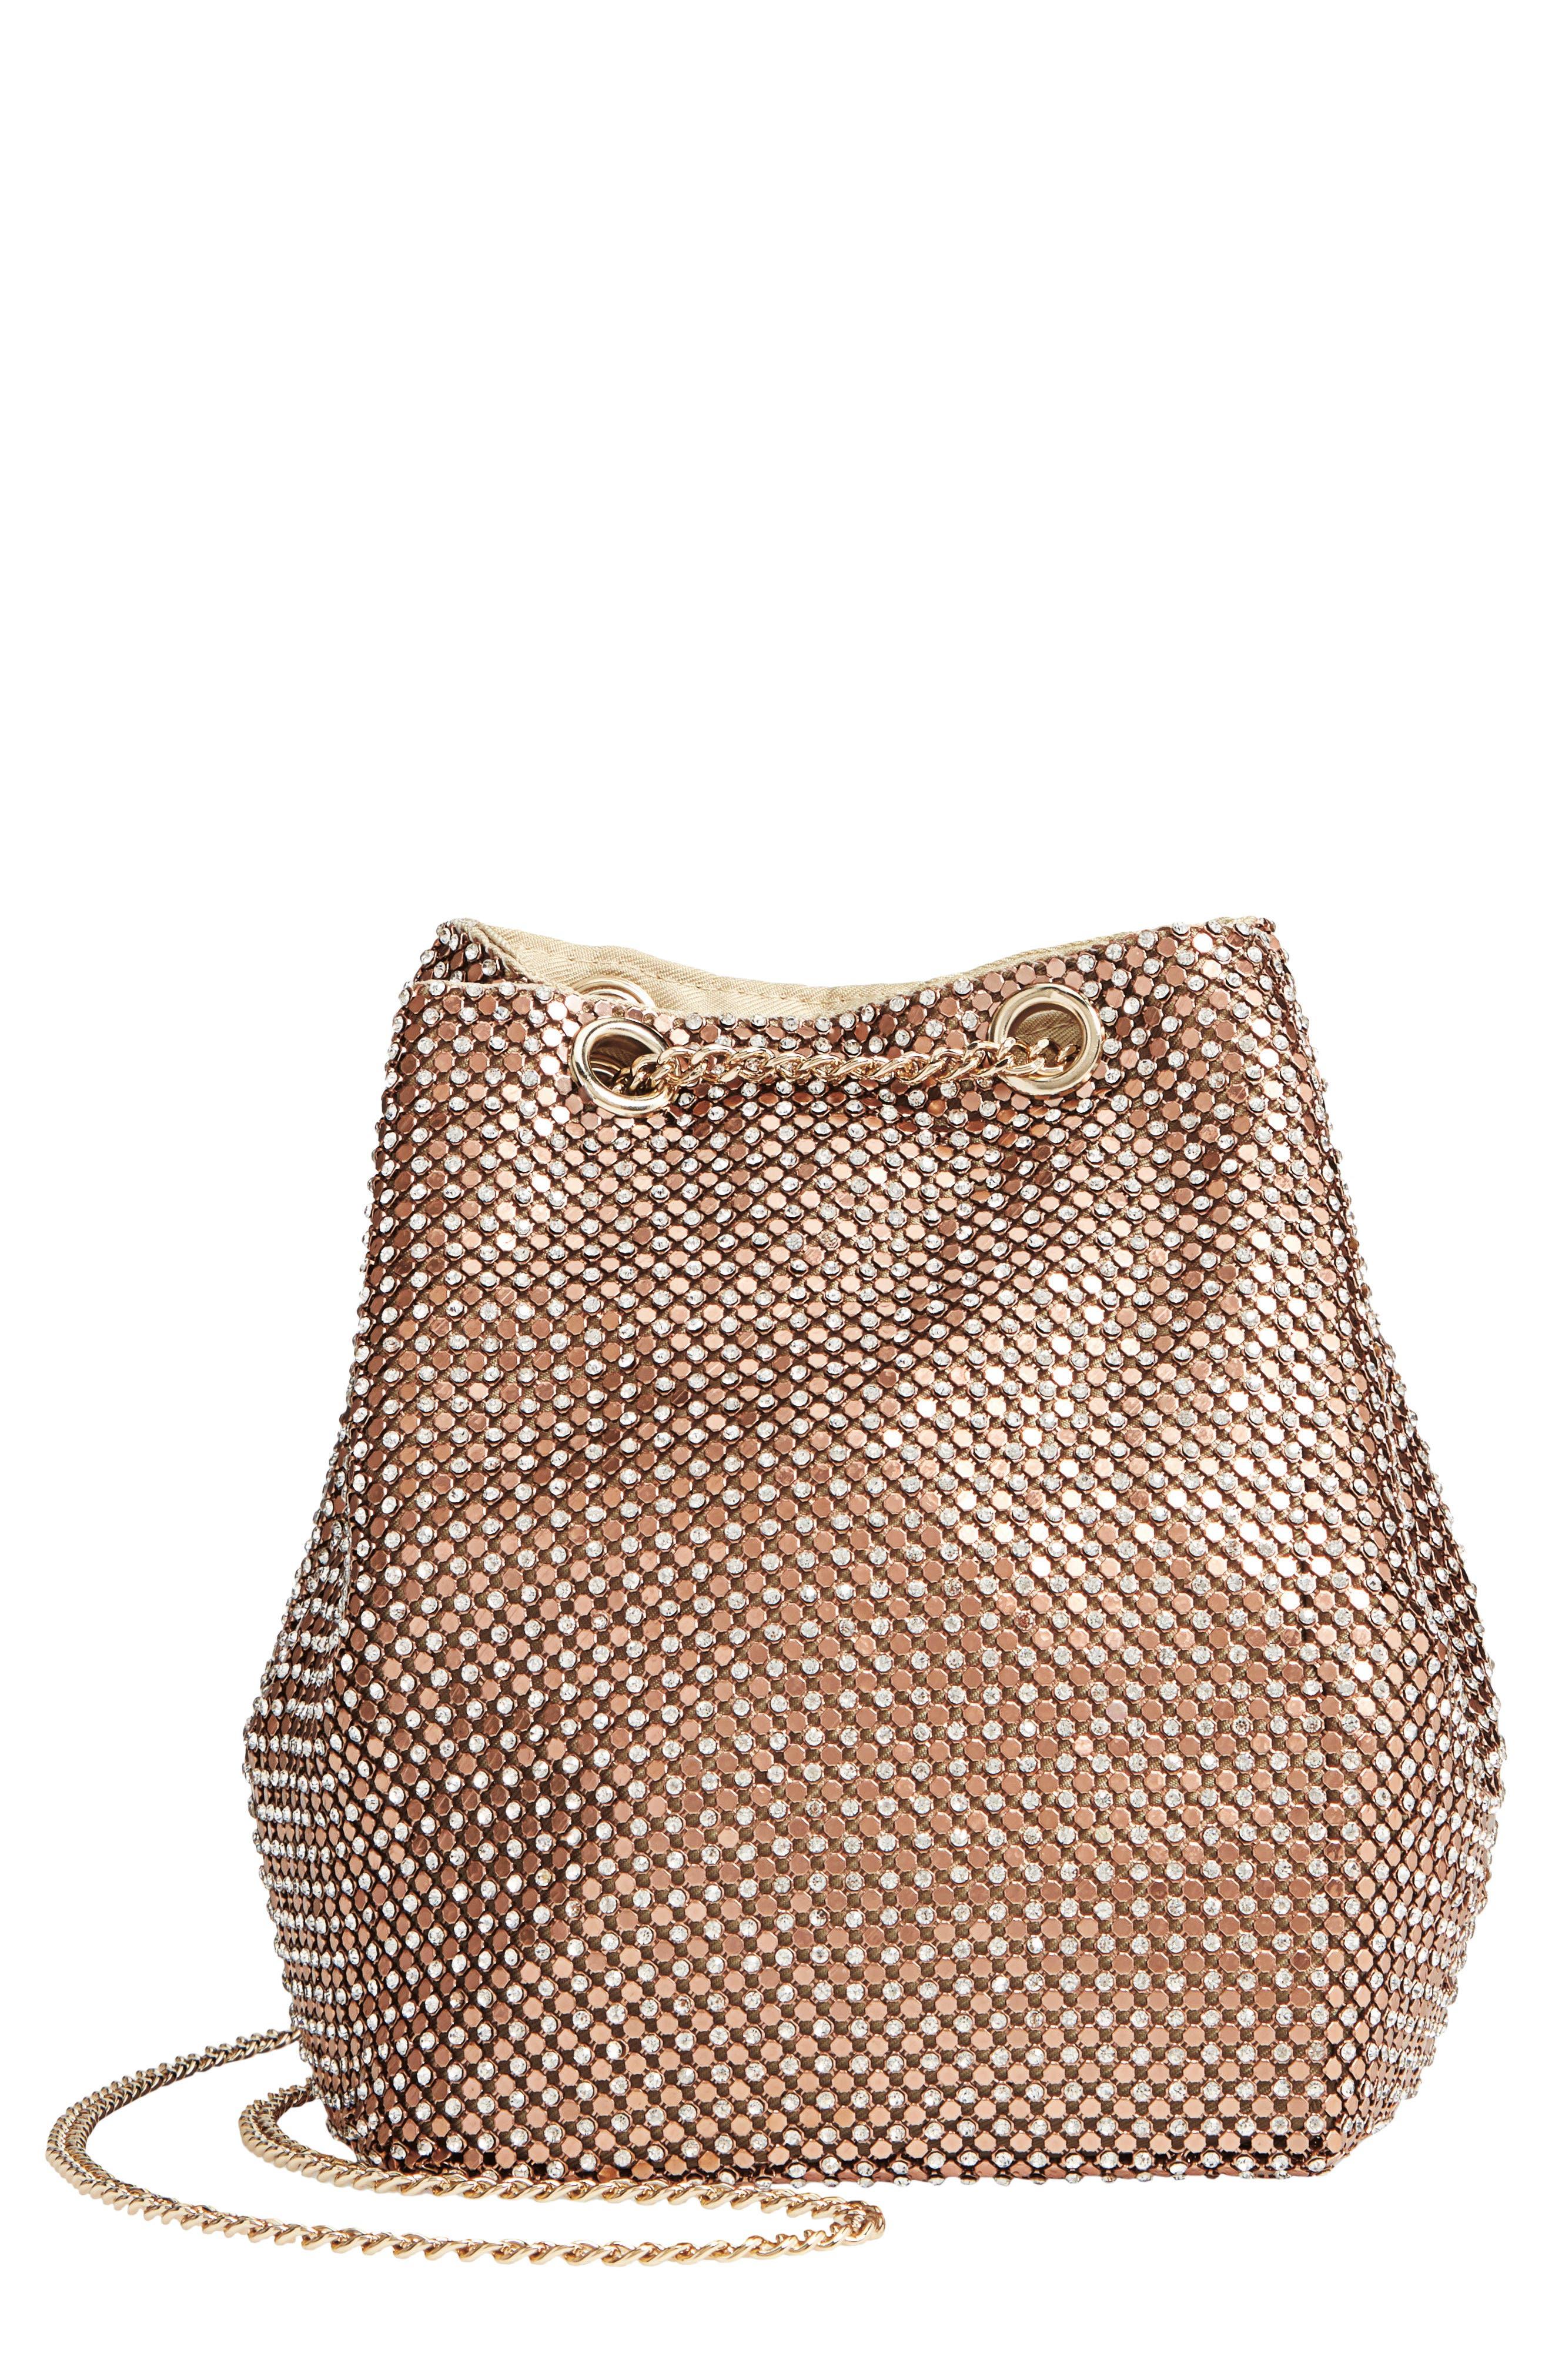 Crystal Mesh Crossbody Bucket Bag,                             Alternate thumbnail 7, color,                             ROSE GOLD